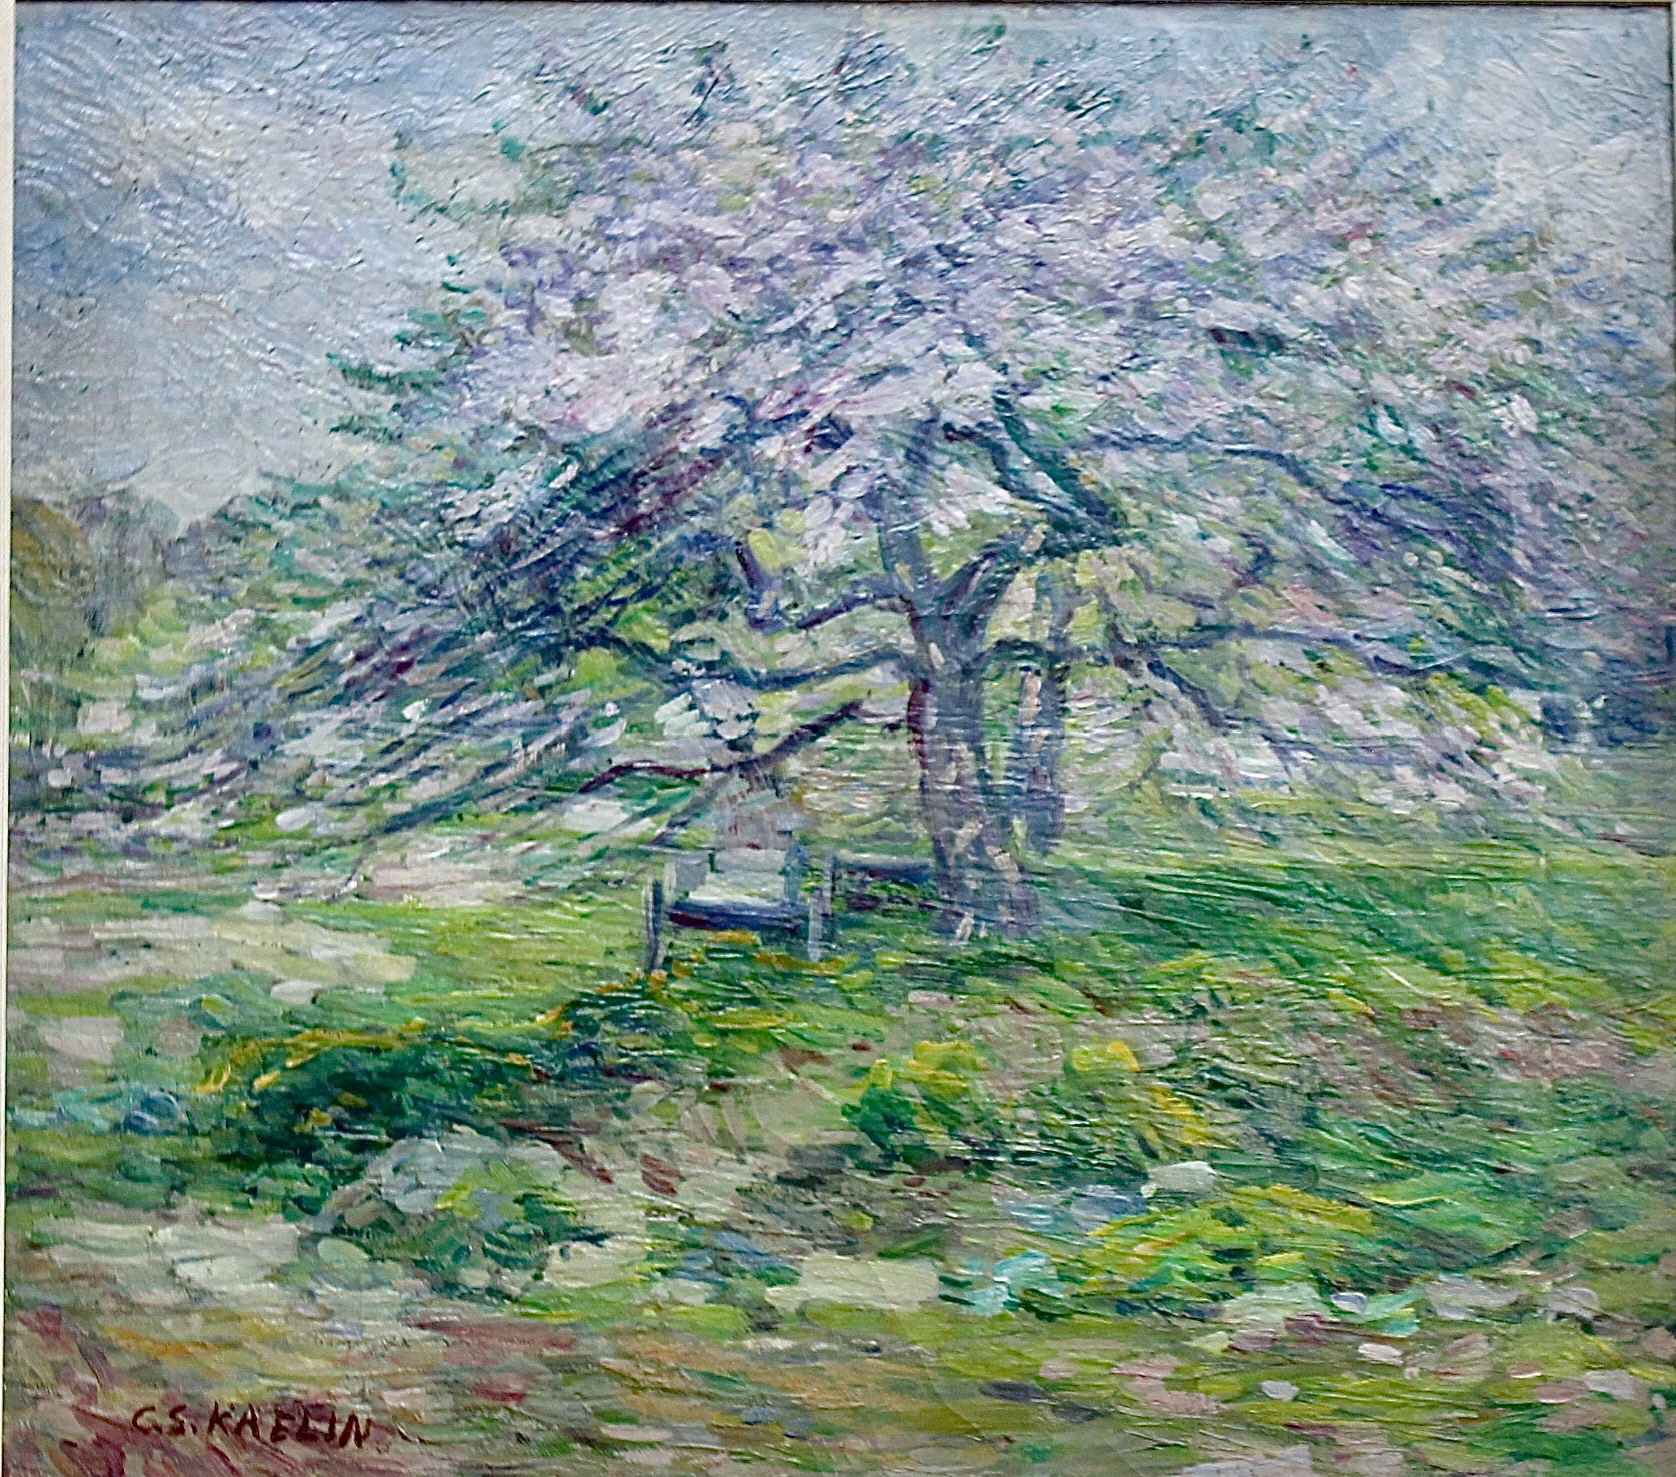 """Apple Blossoms"", 15 1/2x17 1/2"